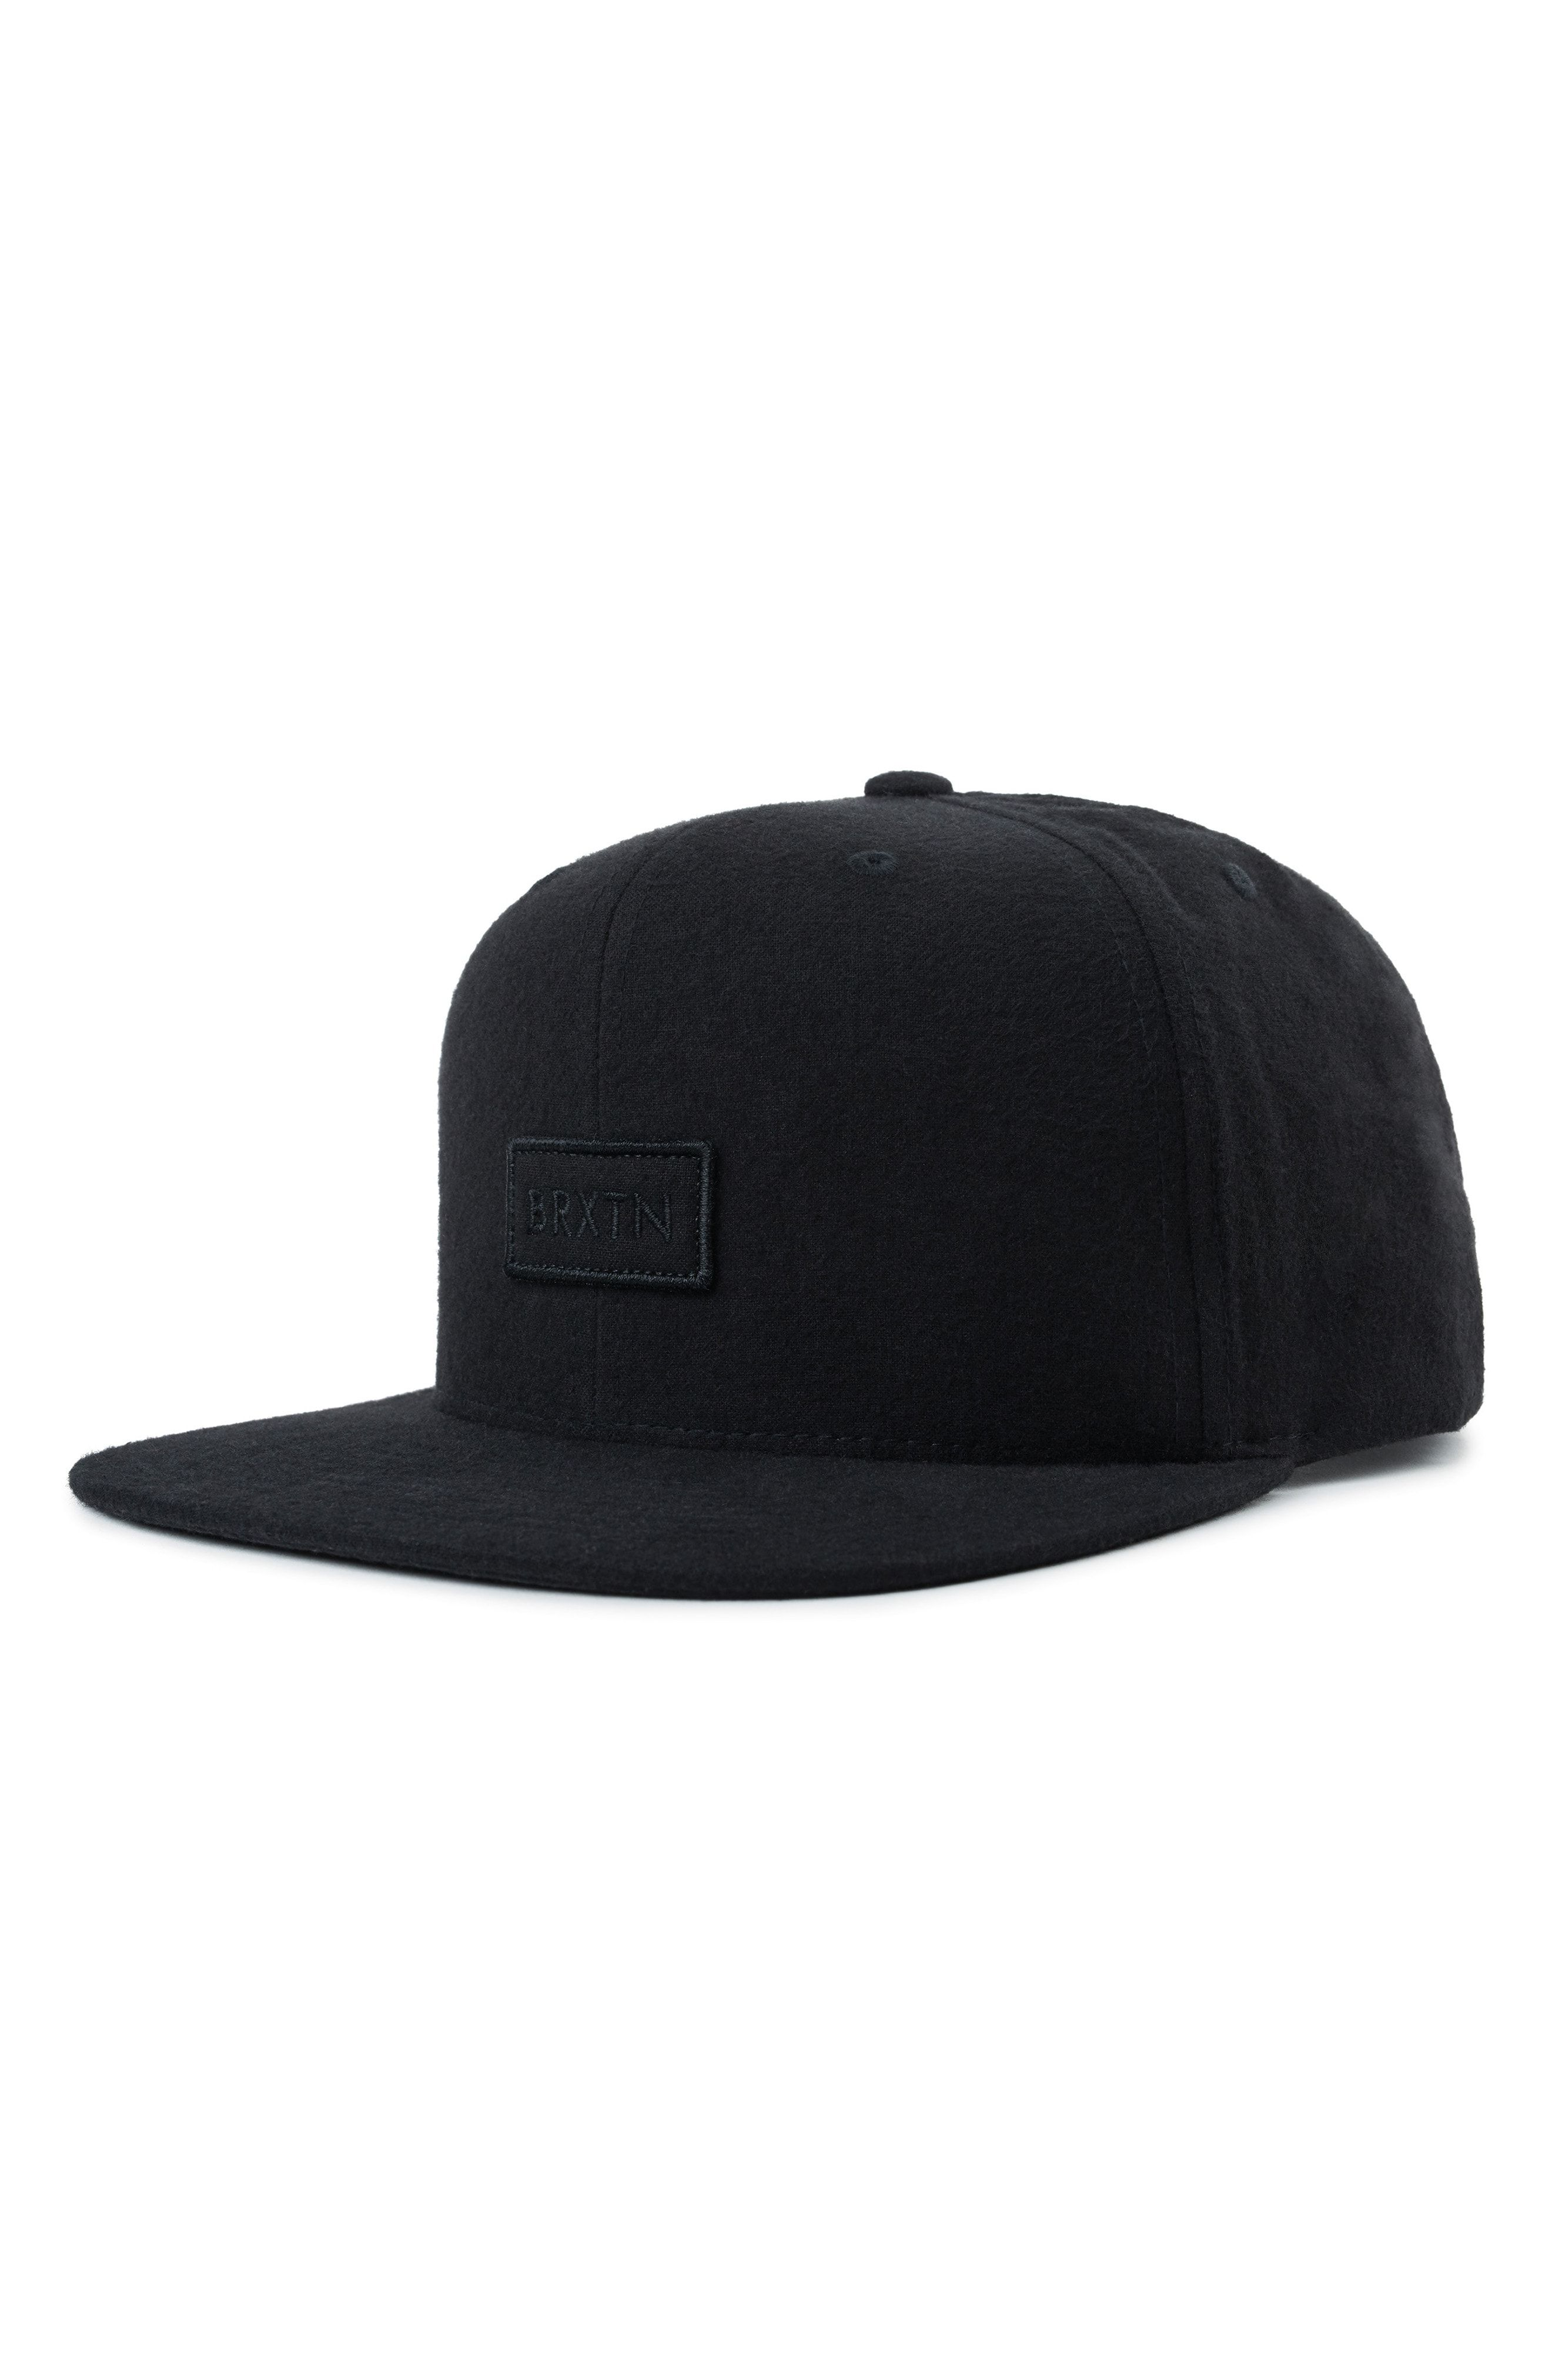 297558968c BRIXTON RIFT II FLAT BRIM BASEBALL CAP - BLACK. #brixton | Brixton ...